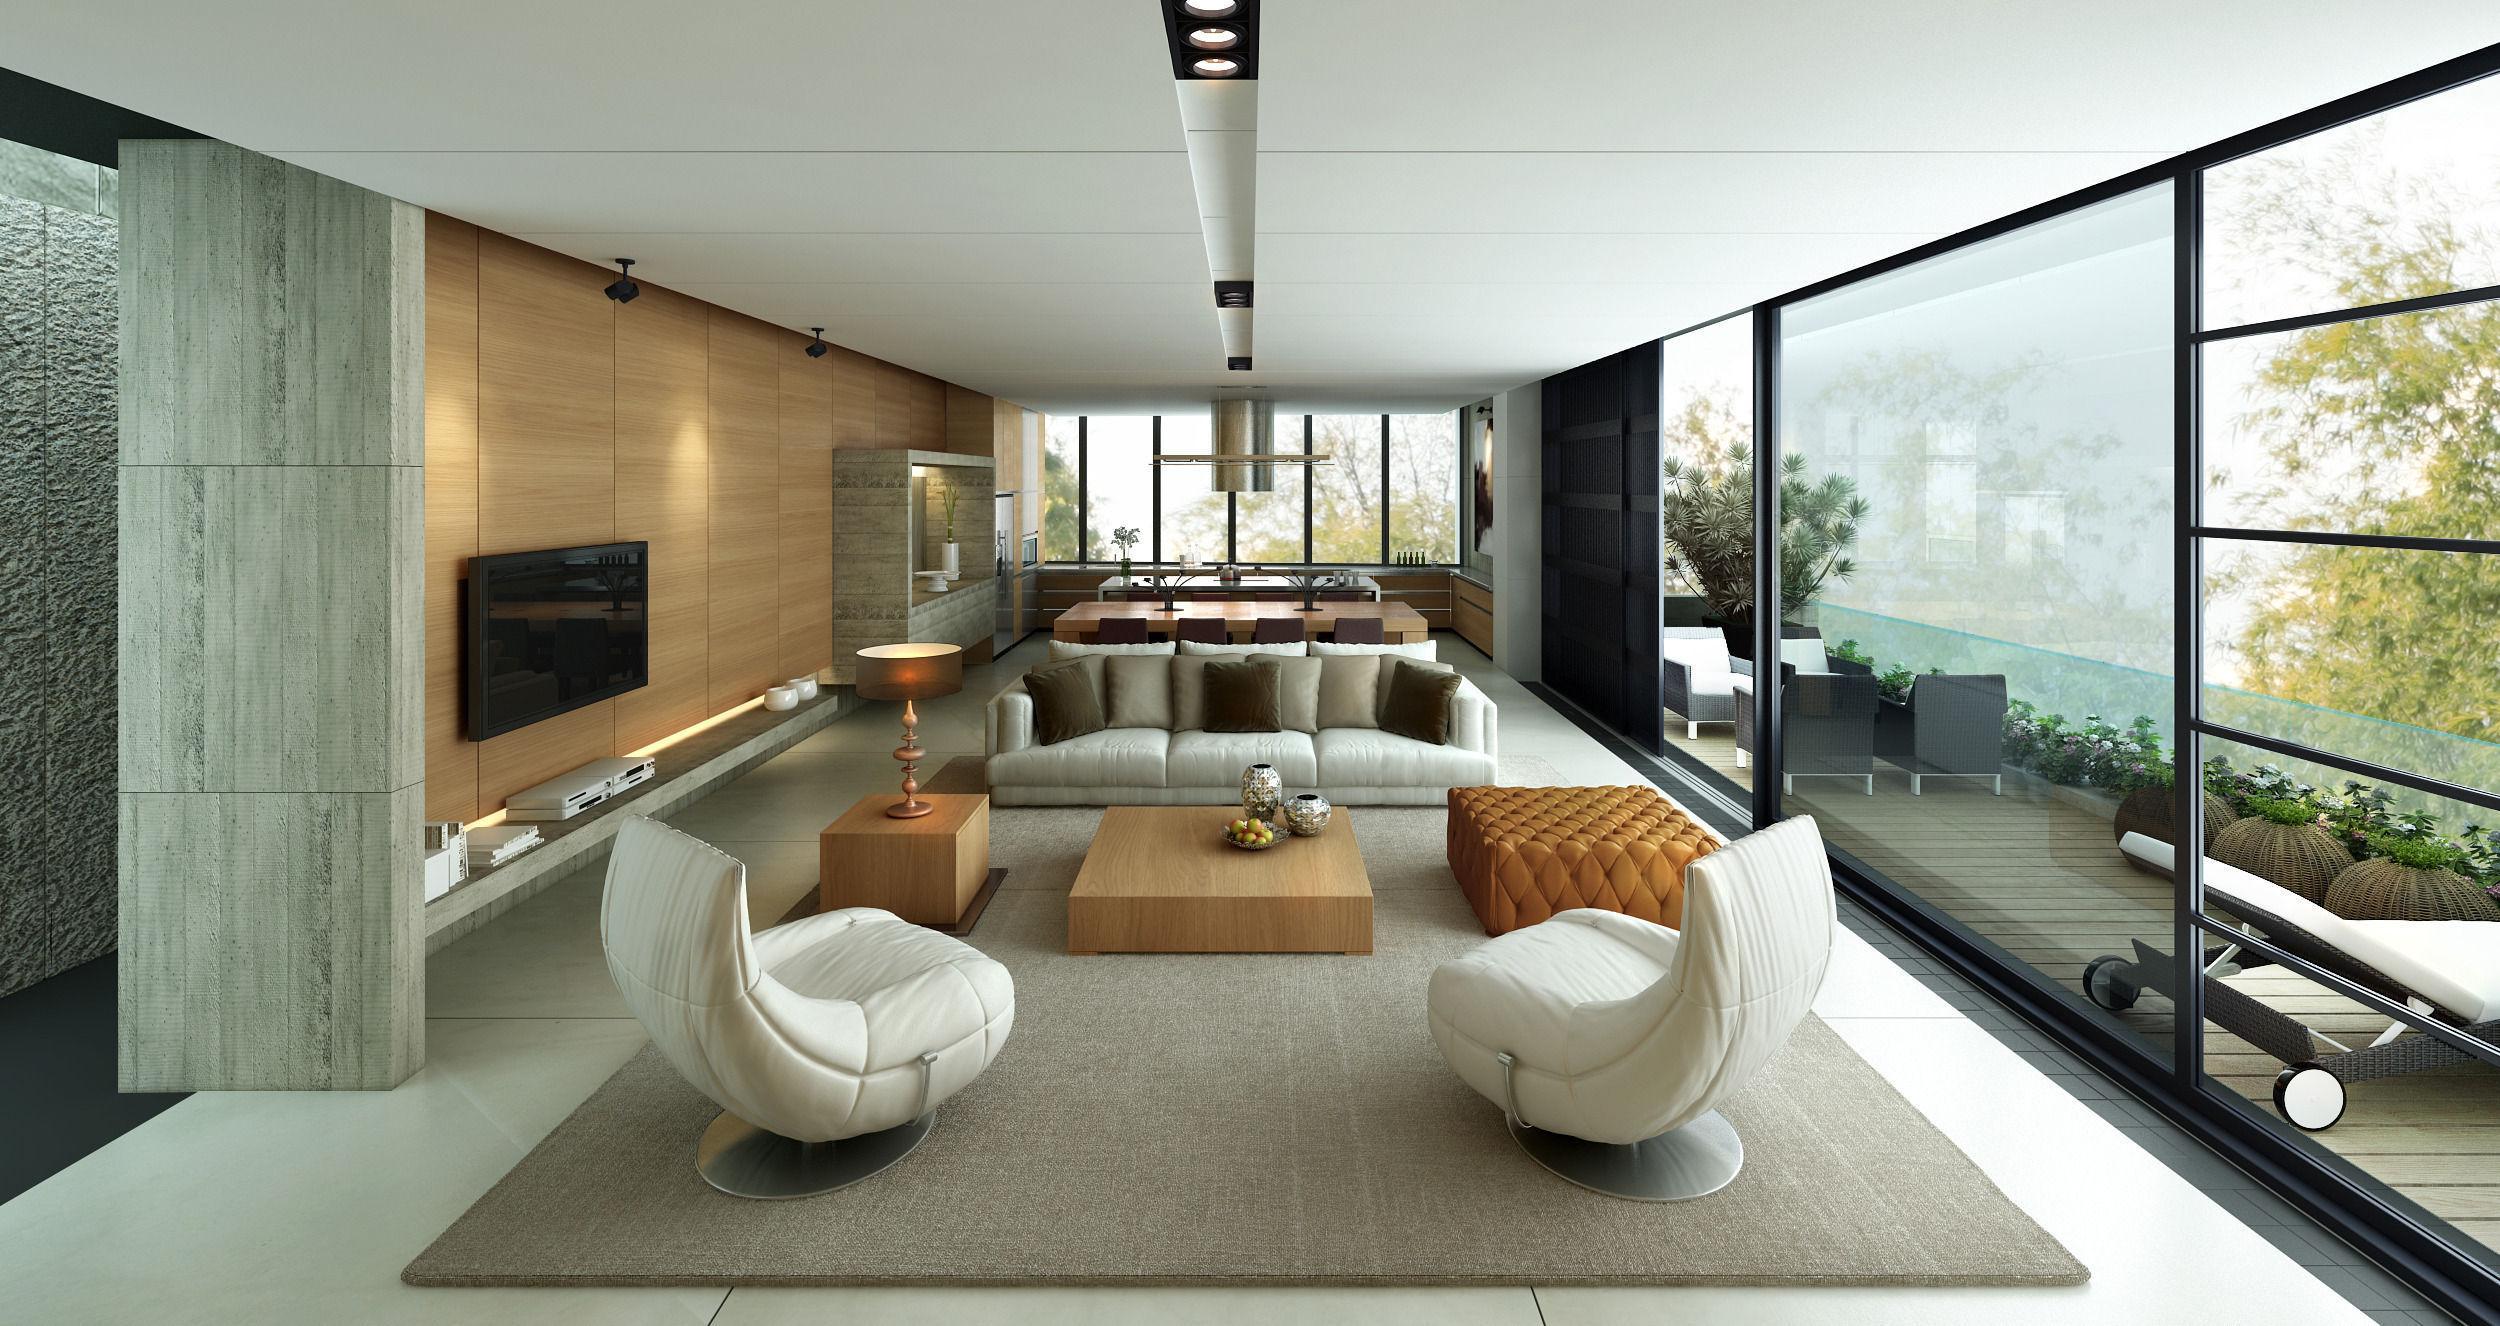 Penthouse Living Room 3d Model Max Fbx 1 ...